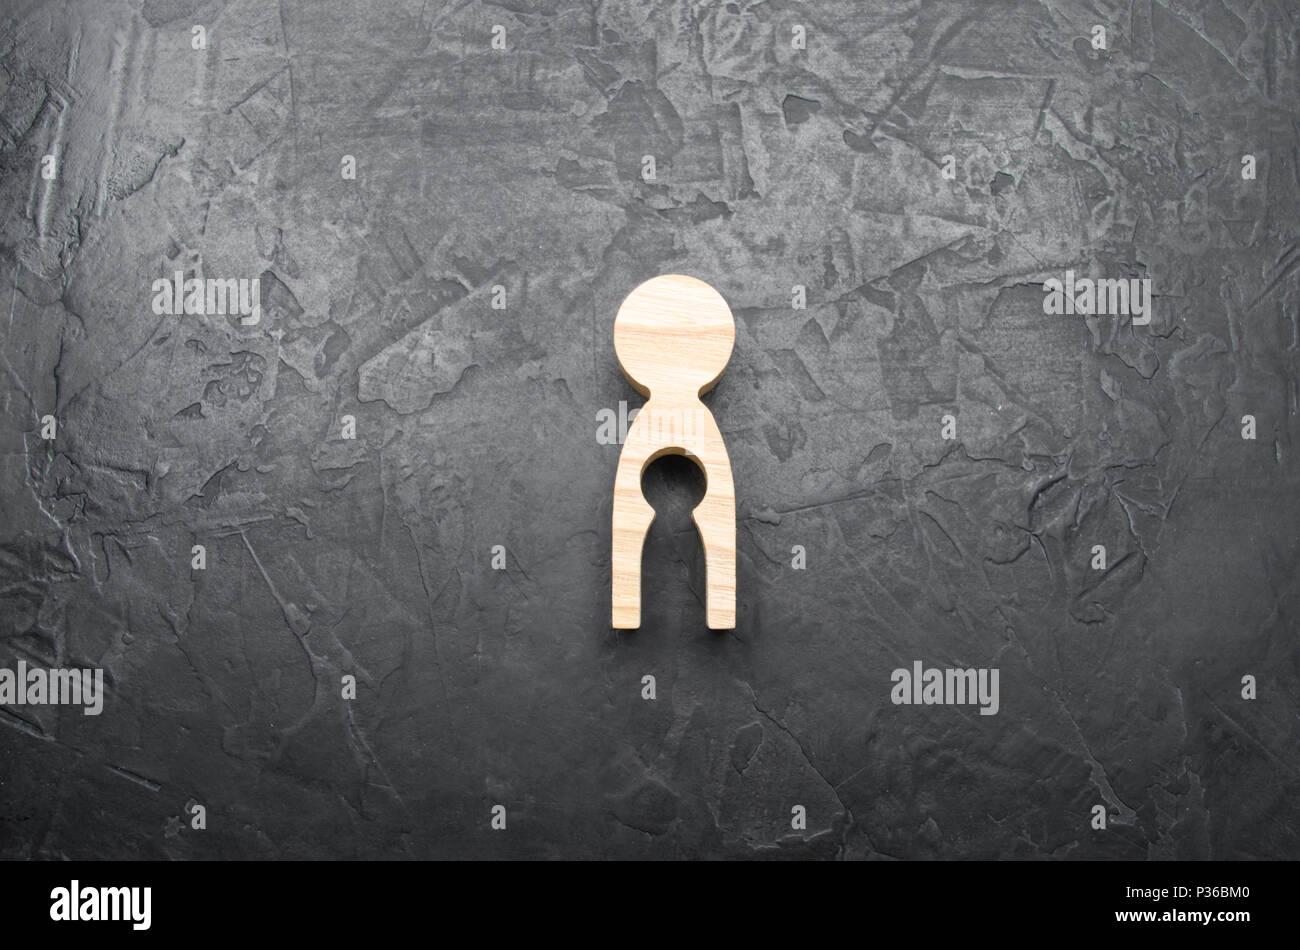 In A Crotch Stockfotos & In A Crotch Bilder - Alamy